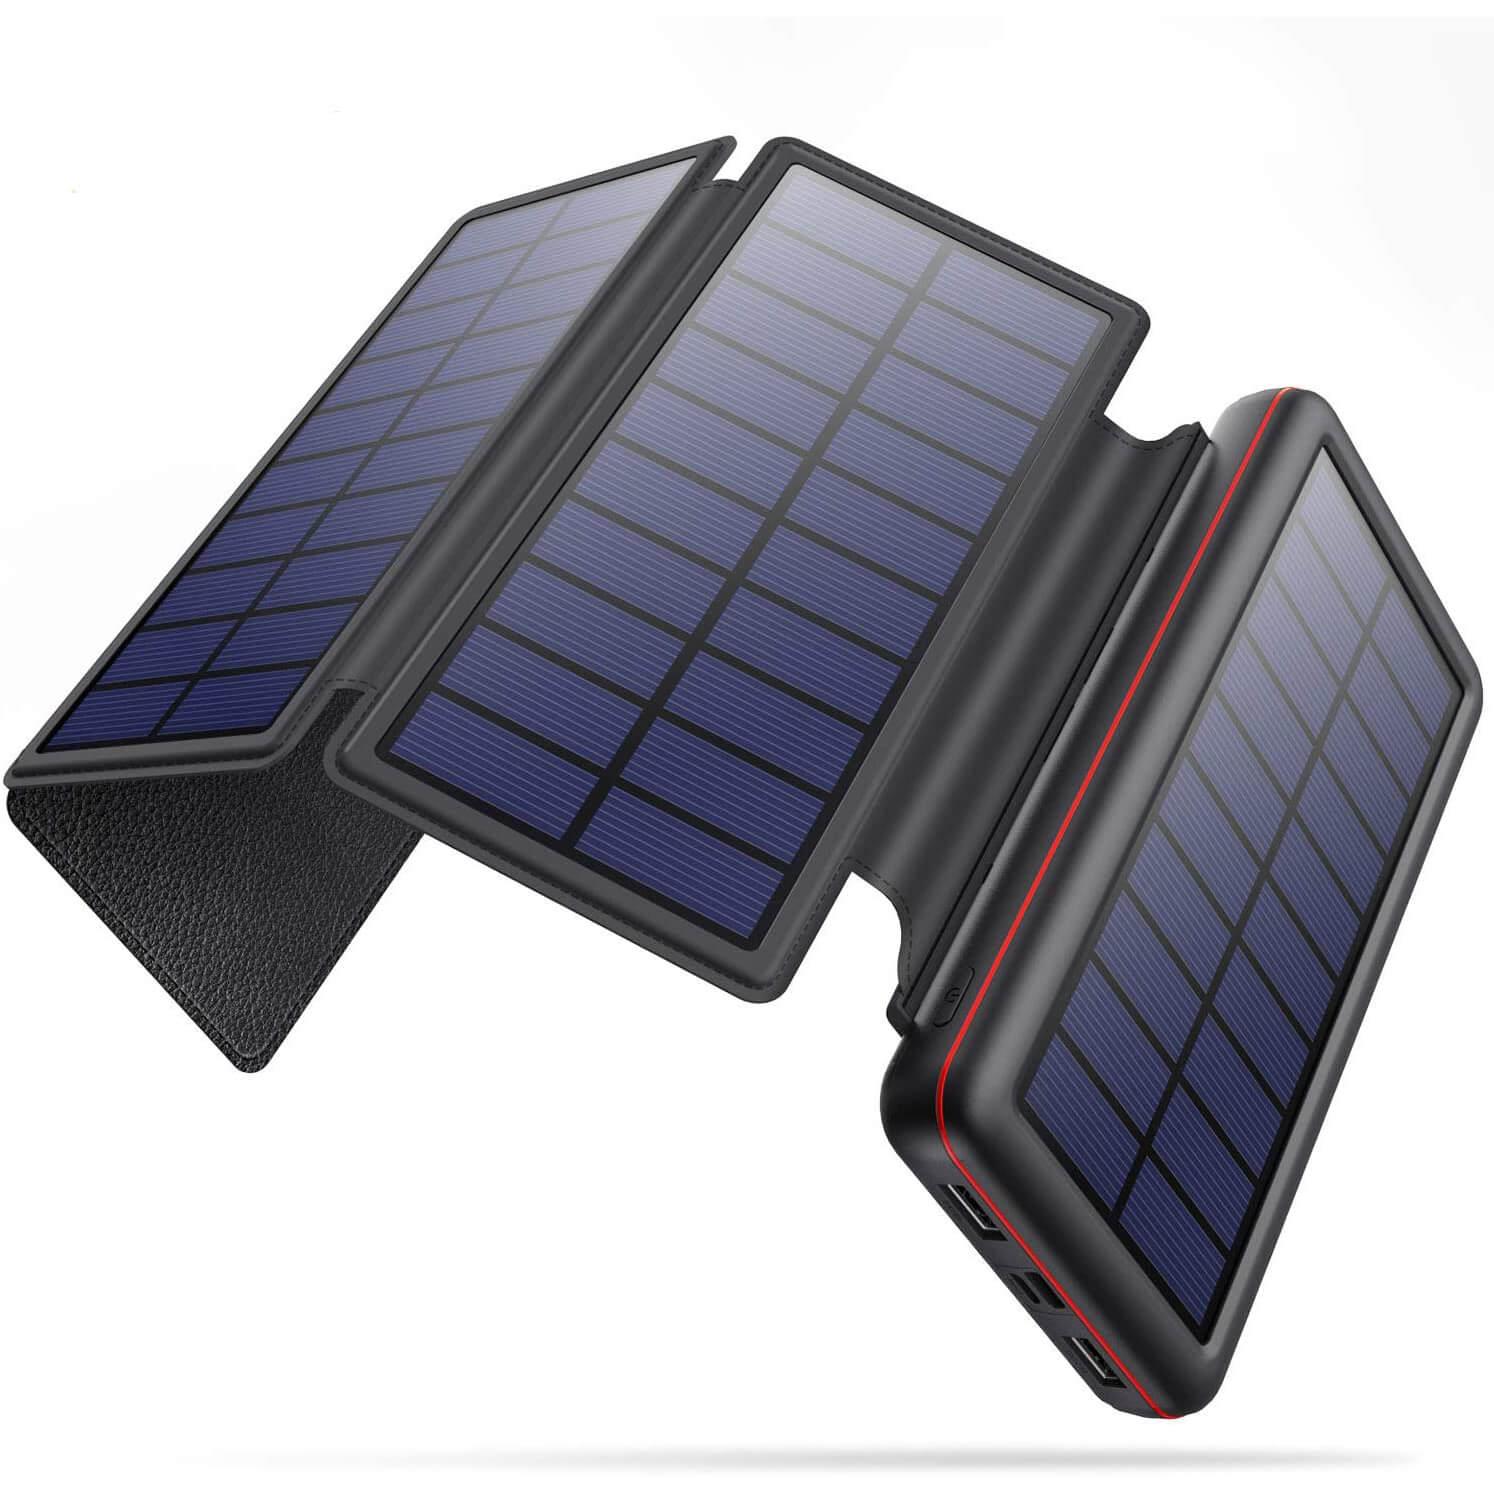 YHO 26800mAh Solar Power Bank